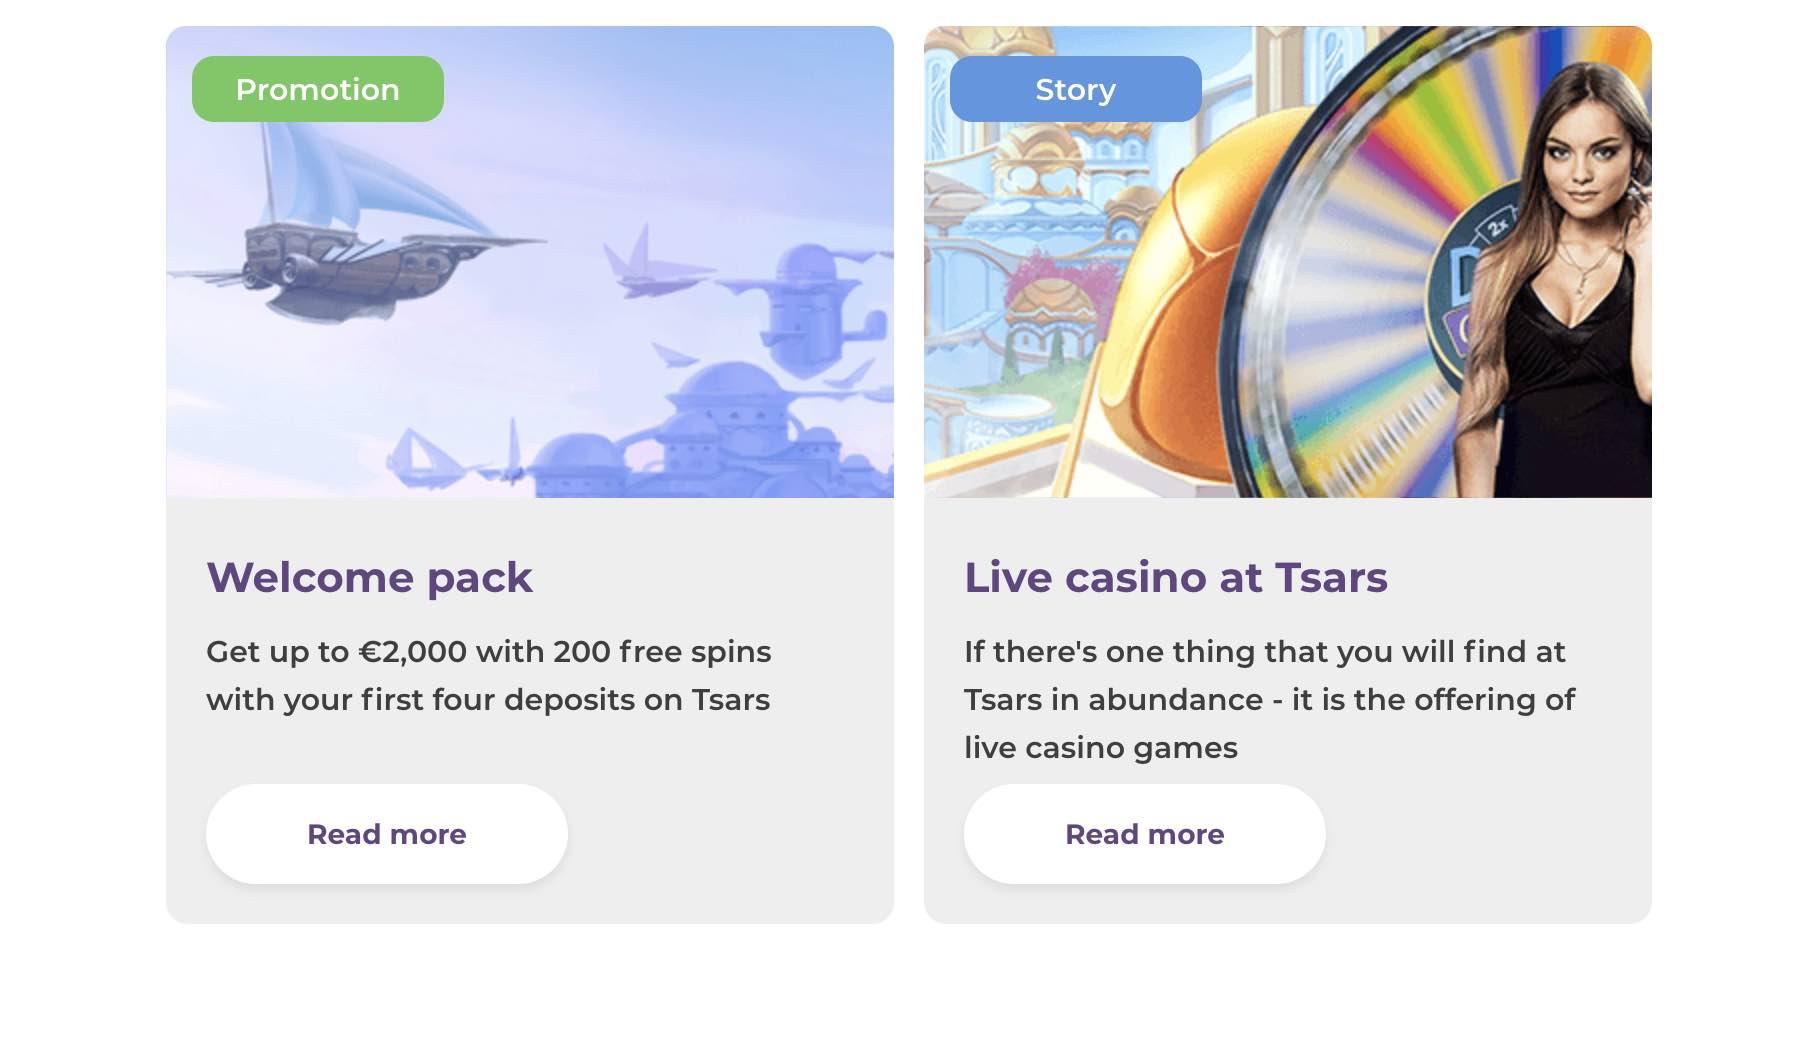 Promotions and Bonuses at Tsars Casino